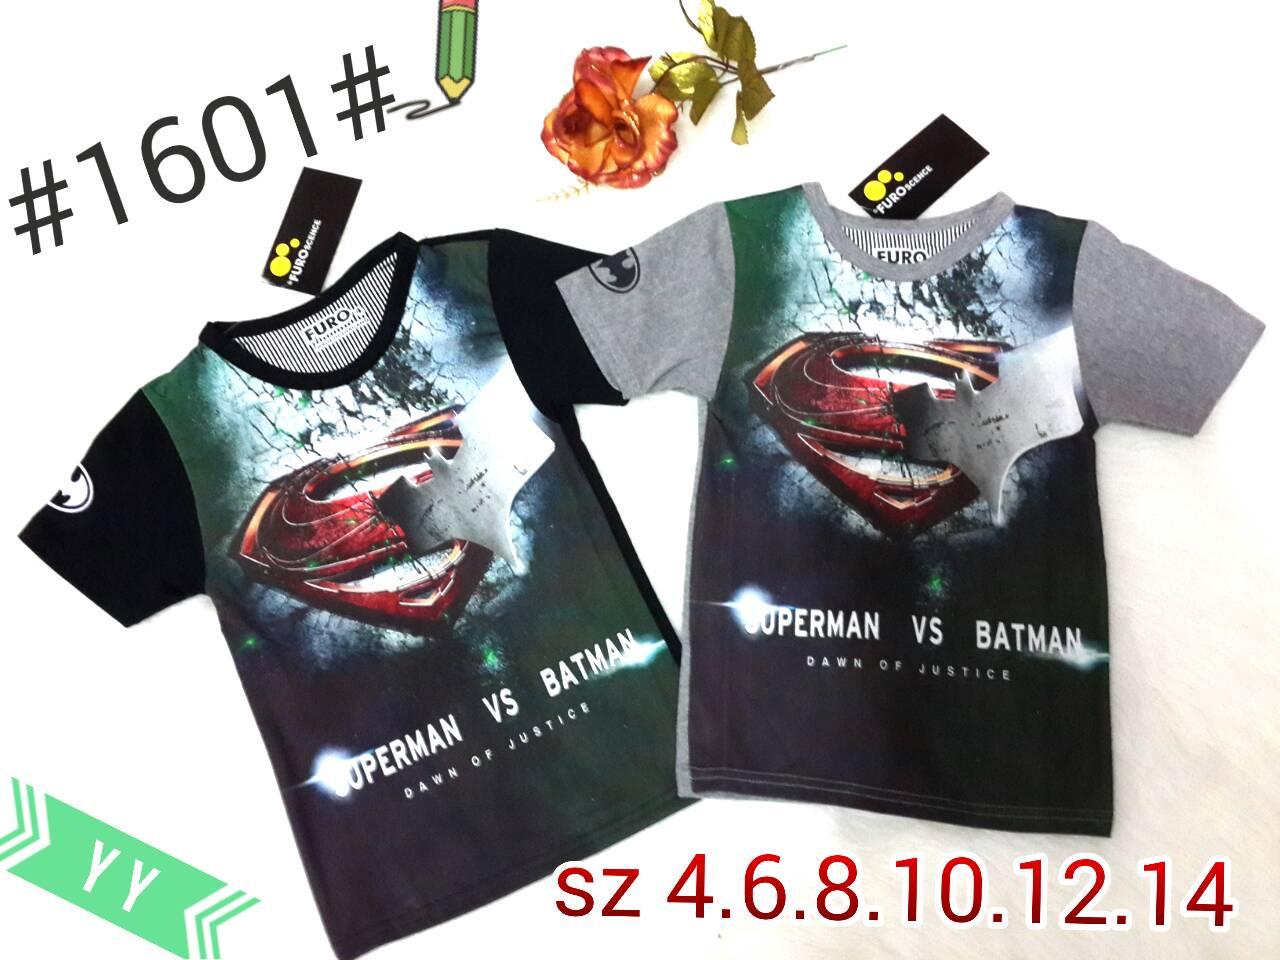 harga Kaos Printing Furo Logo Superman VS Batman # 1601# Tokopedia.com